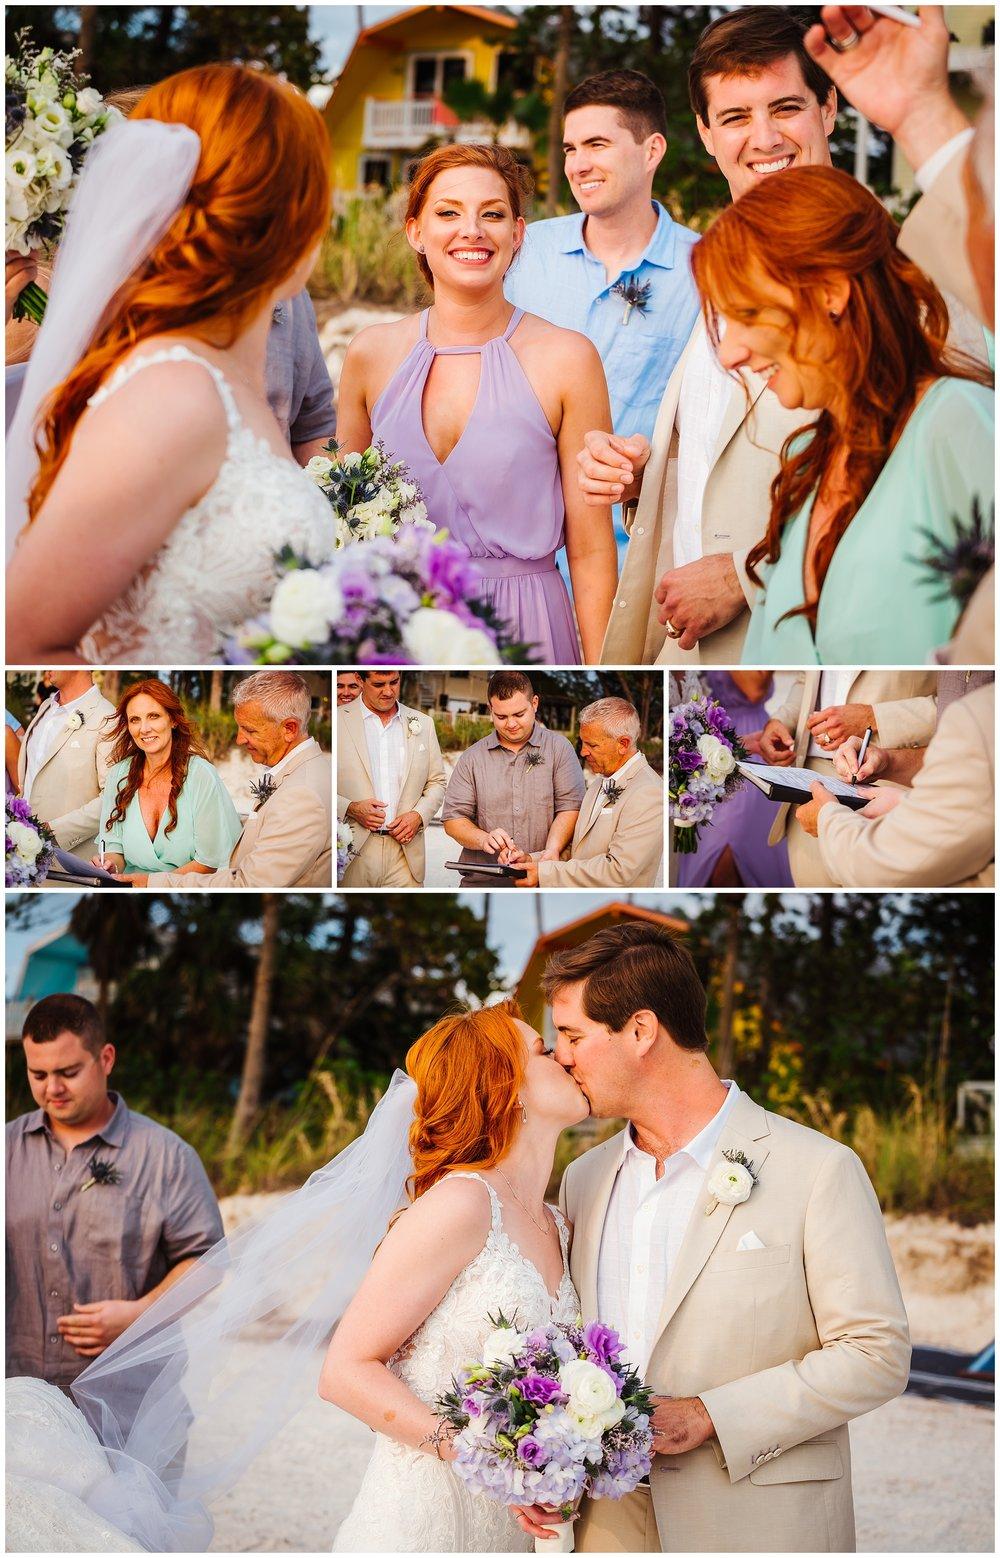 tampa-st-pete-wedding-photographer-indian-rocks-beach-mermaid-train-redhead_0141.jpg